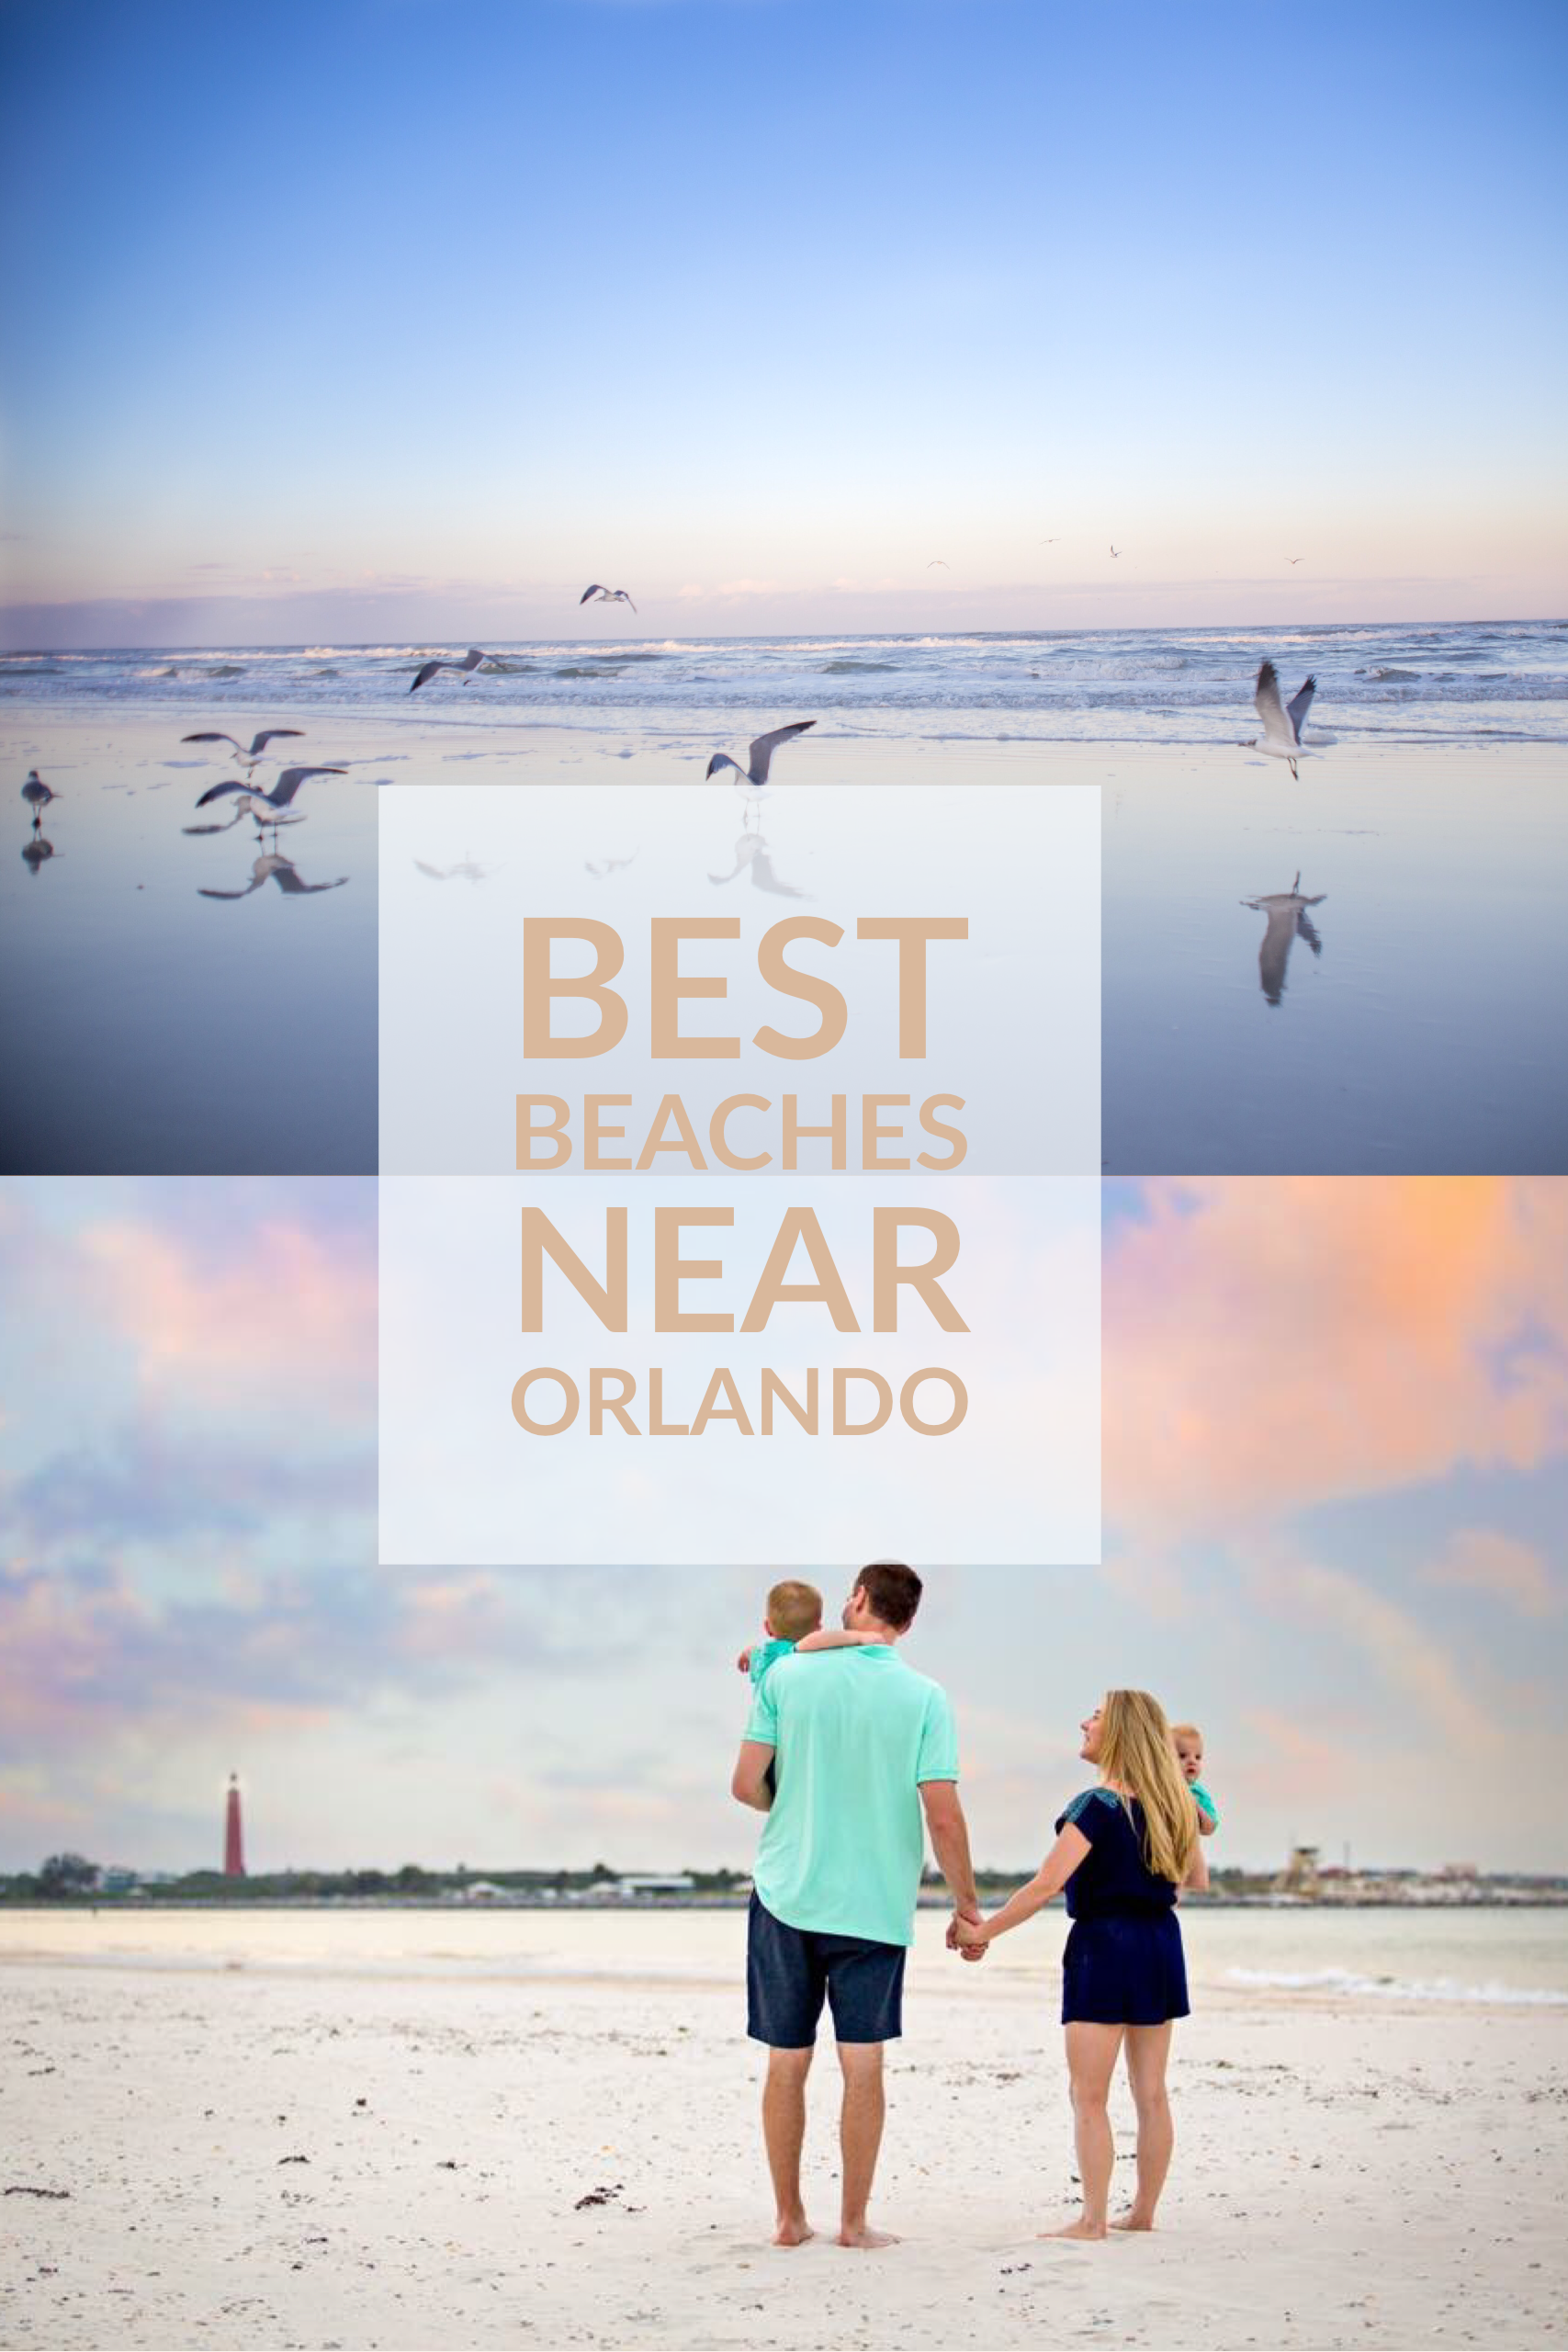 Take A Beach Day And Enjoy Florida S White Sandy Beaches Best Near Orlando Fl